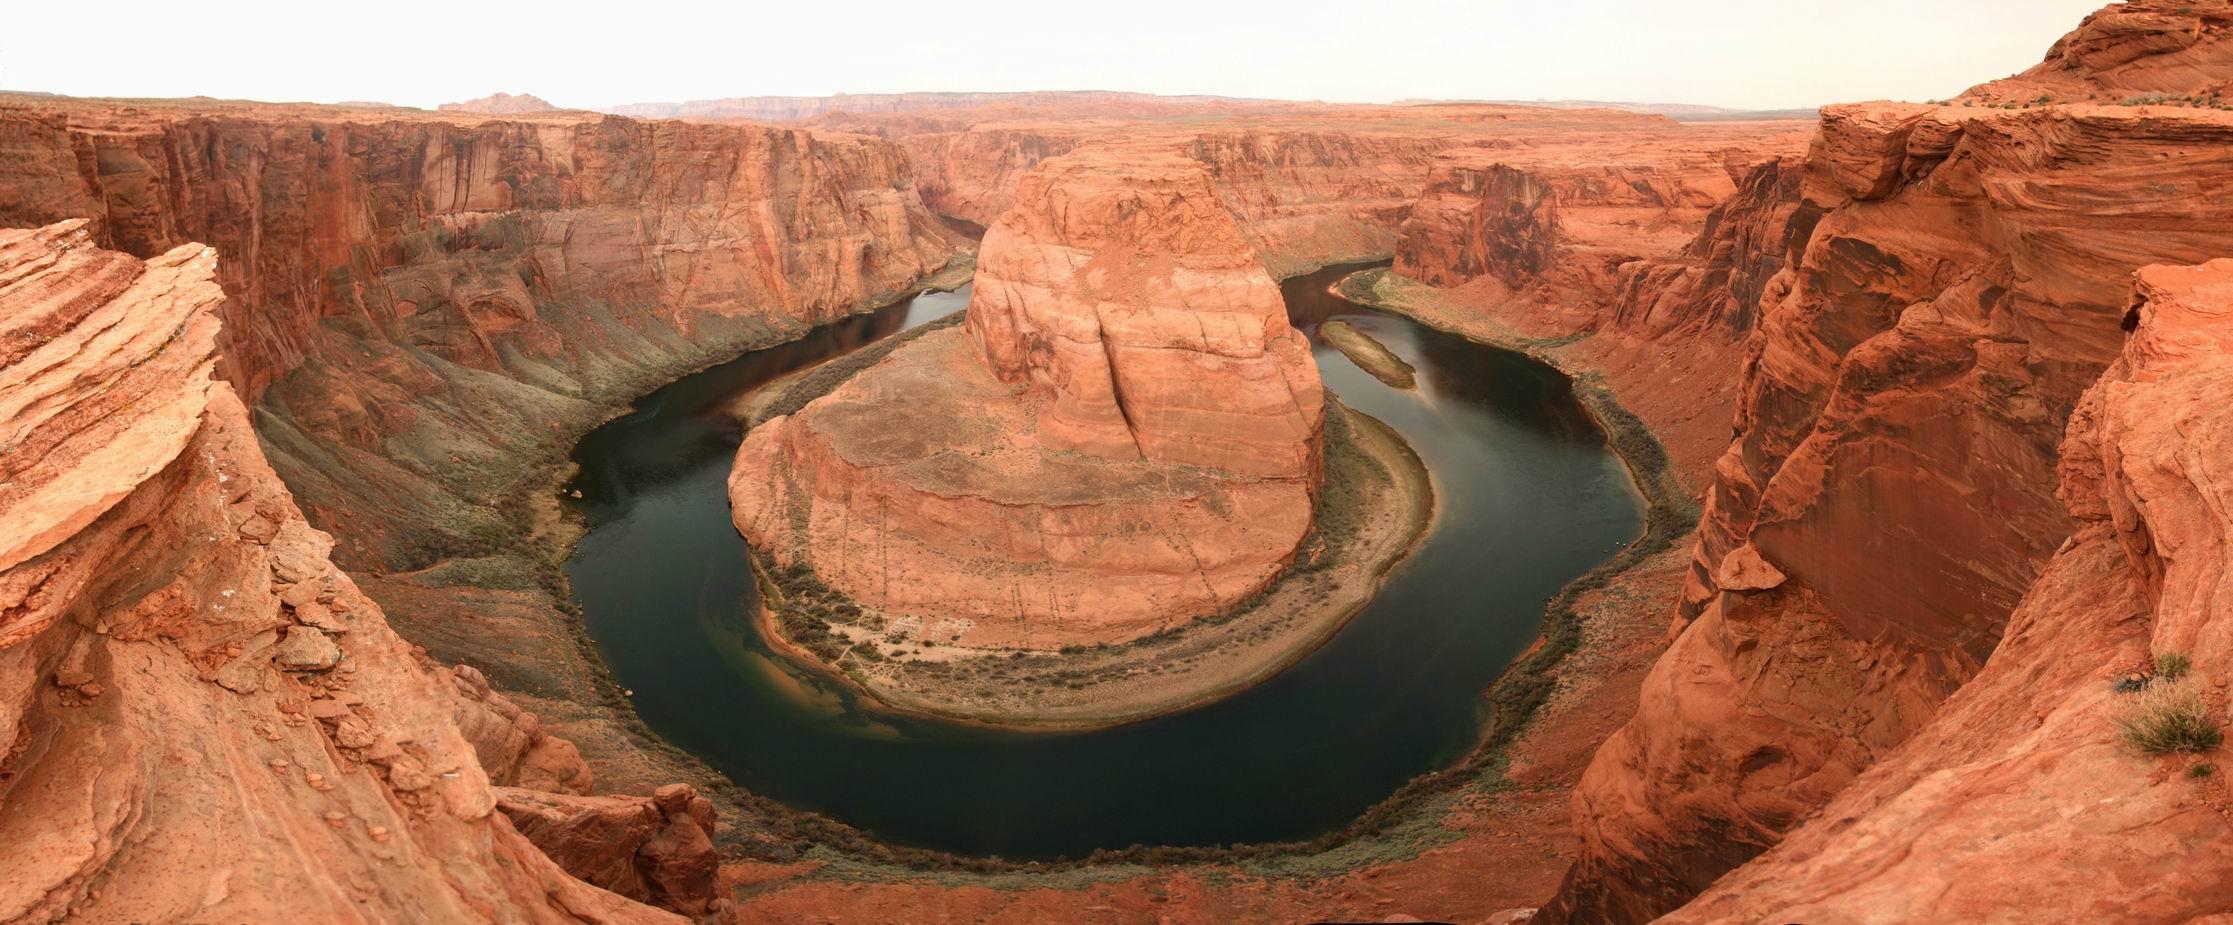 Horseshoe Bend, Colorado River, Arizona, USA